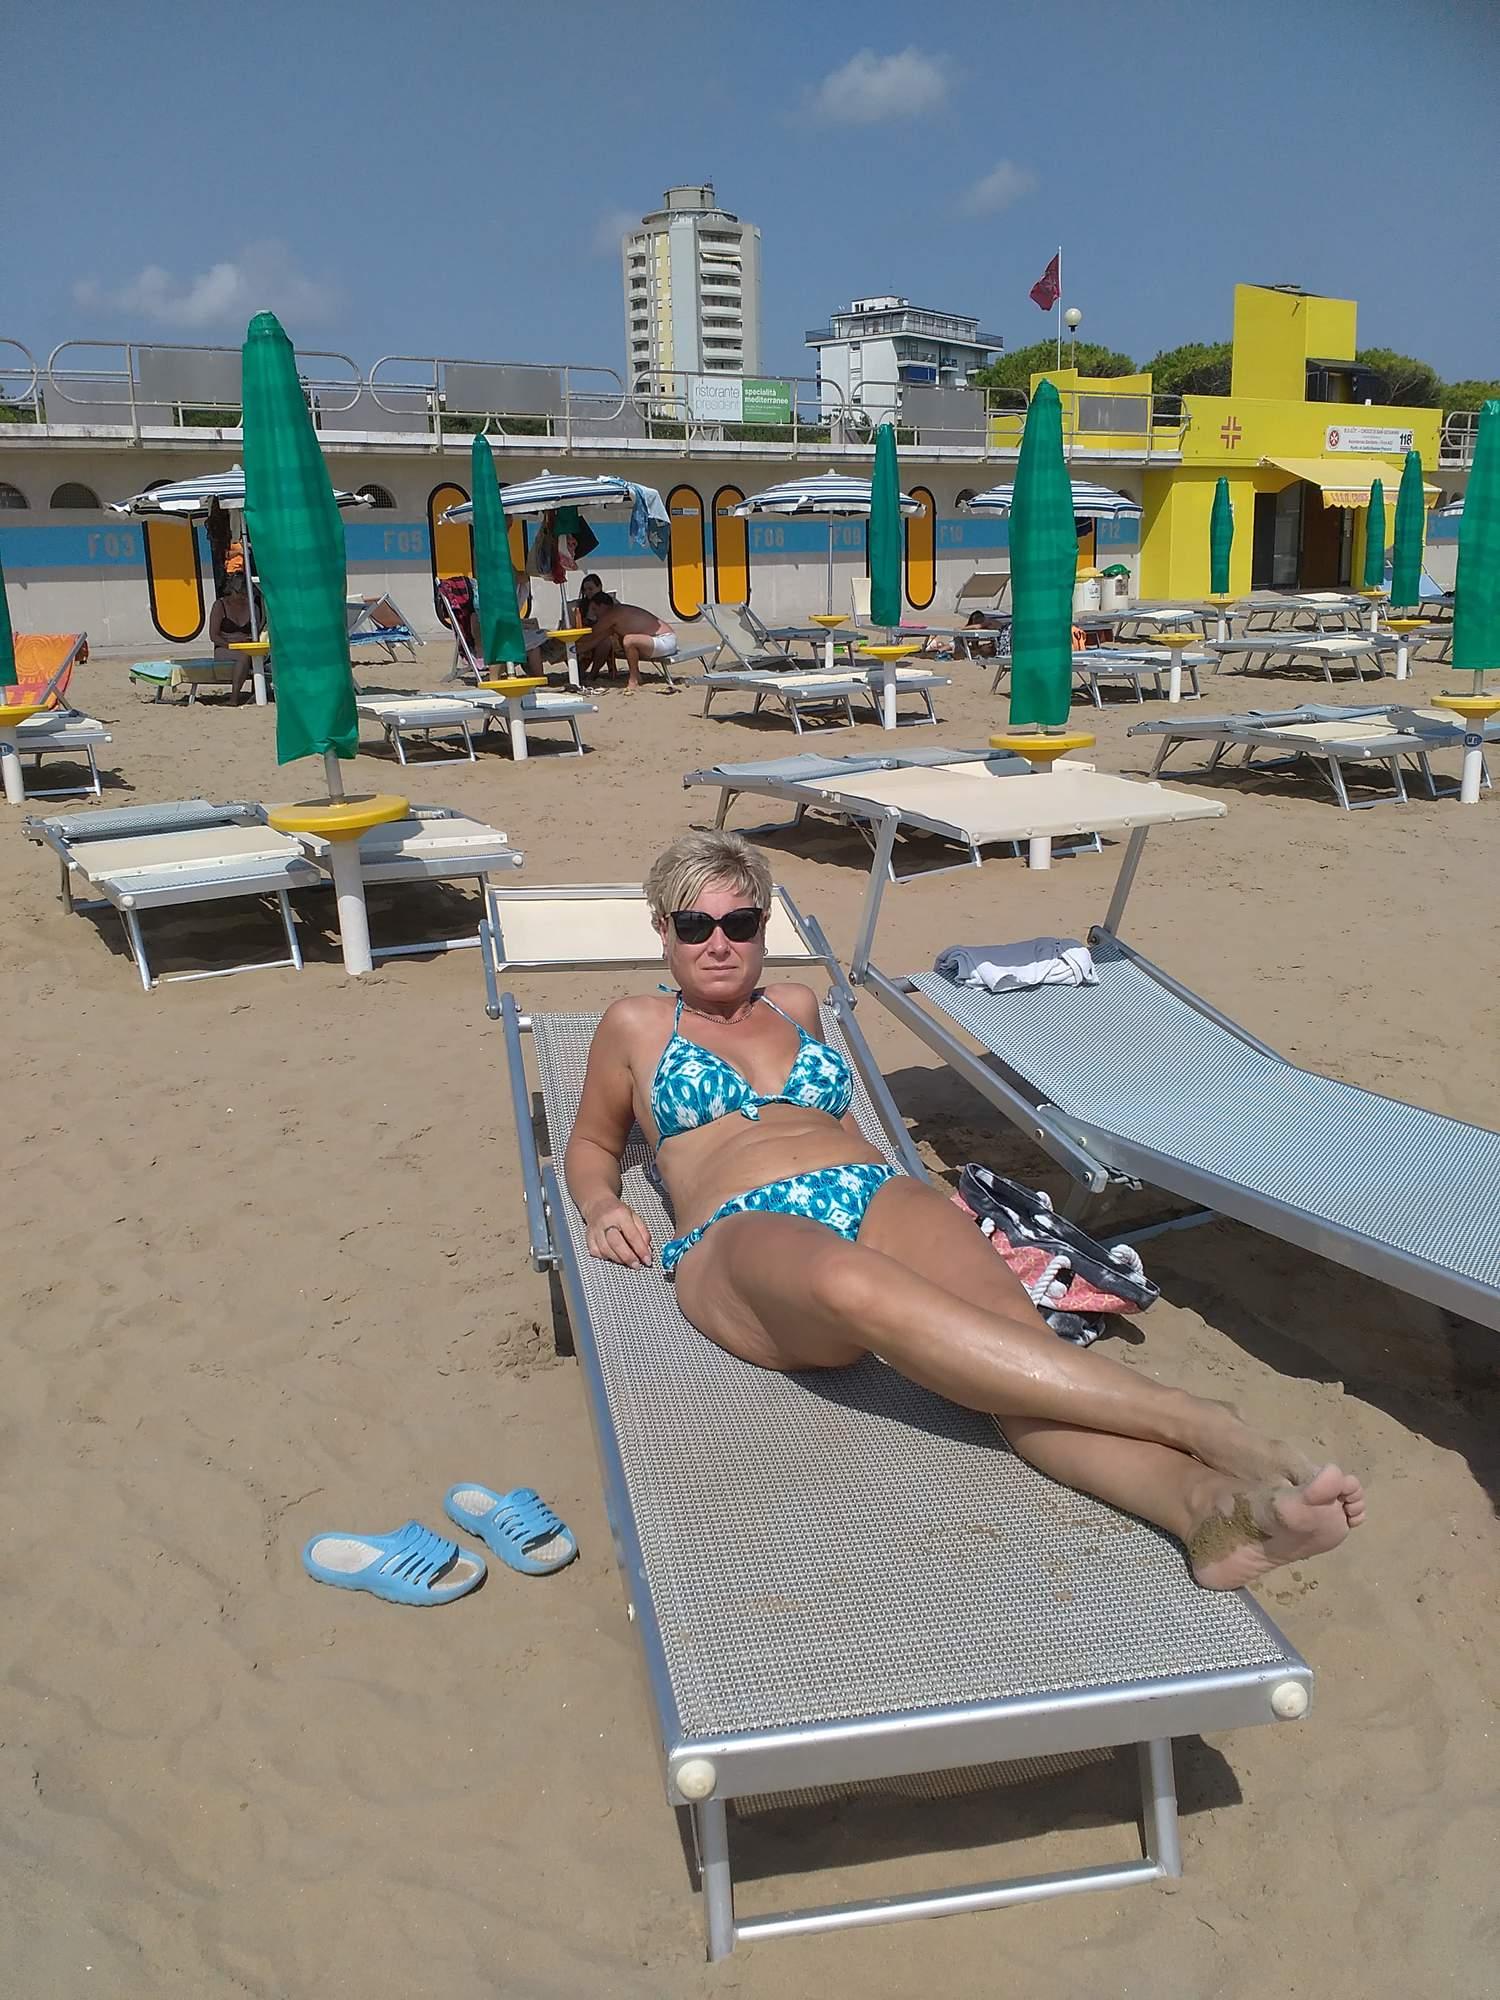 http://img25.rajce.idnes.cz/d2502/14/14660/14660196_9f28440ac985ba1fcc32e6bdf80e4ecf/images/foto_telefon_m_738.jpg